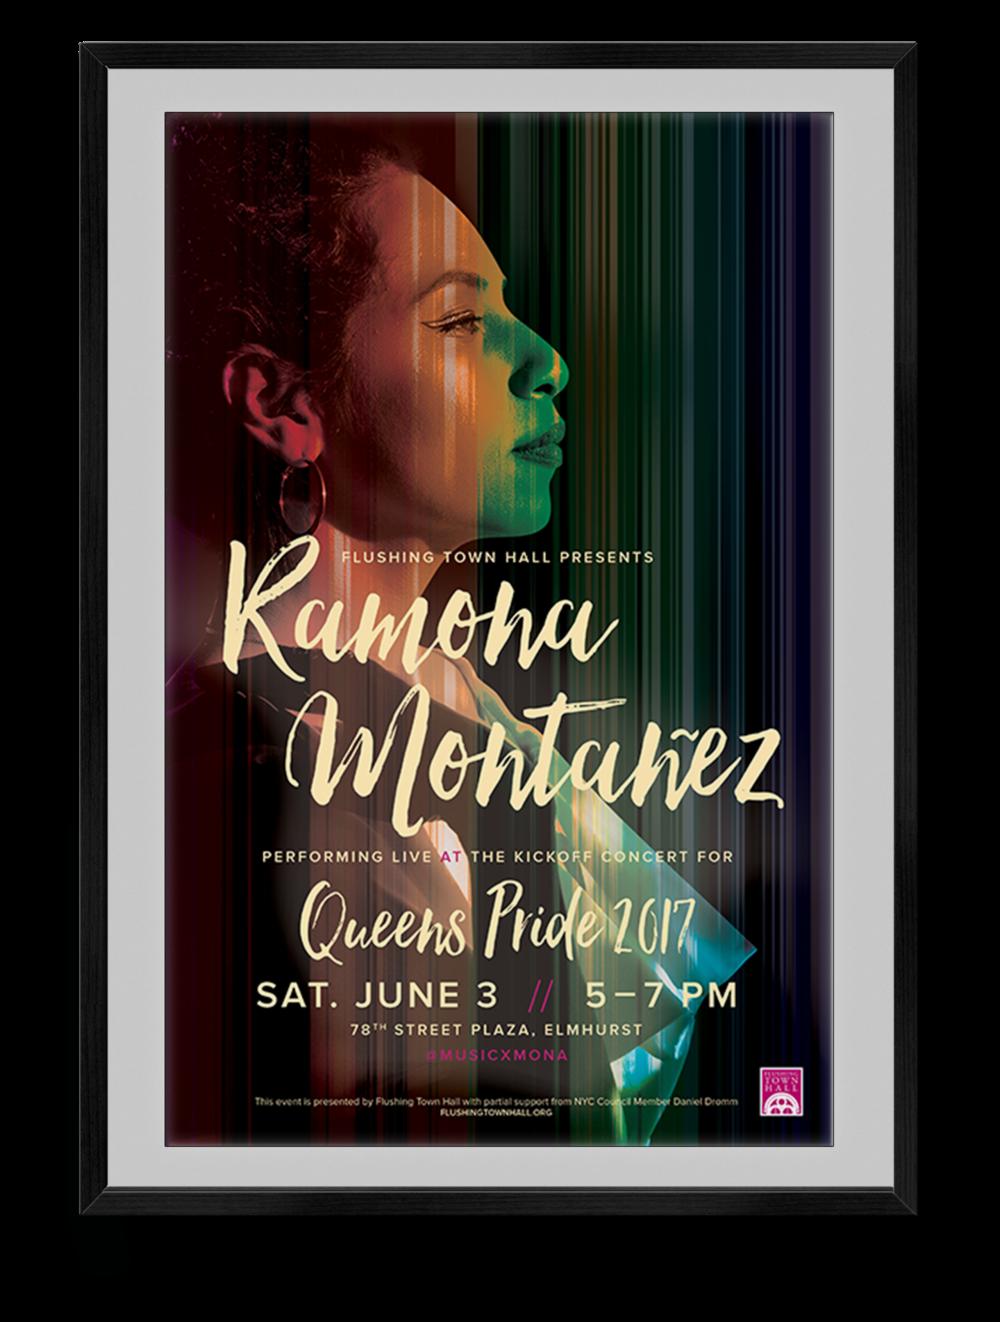 ramona_montanez_poster_3.png